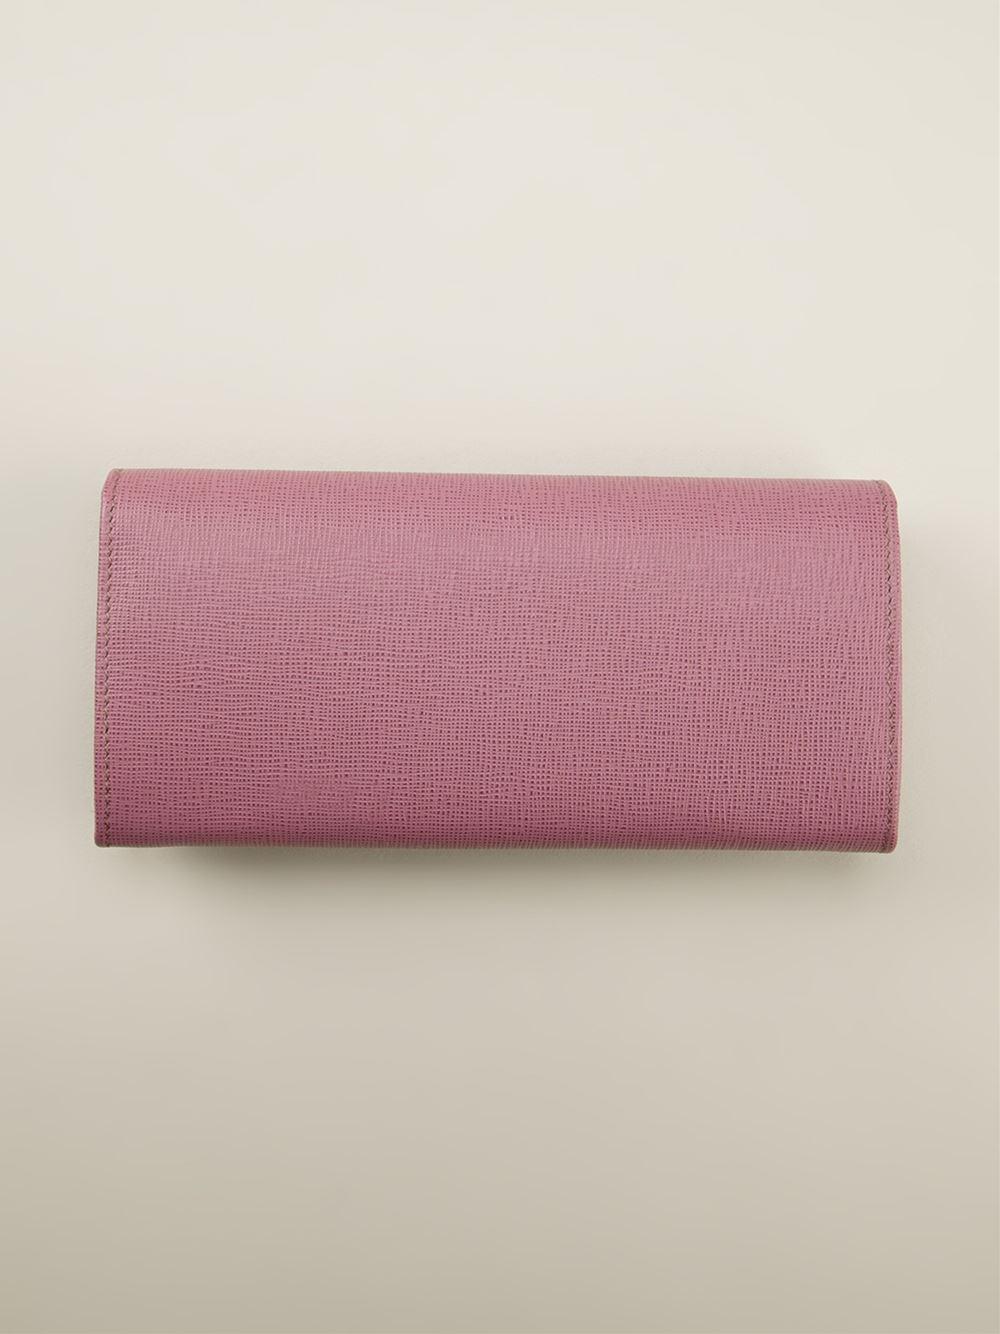 fendi crayon wallet jurn  Gallery